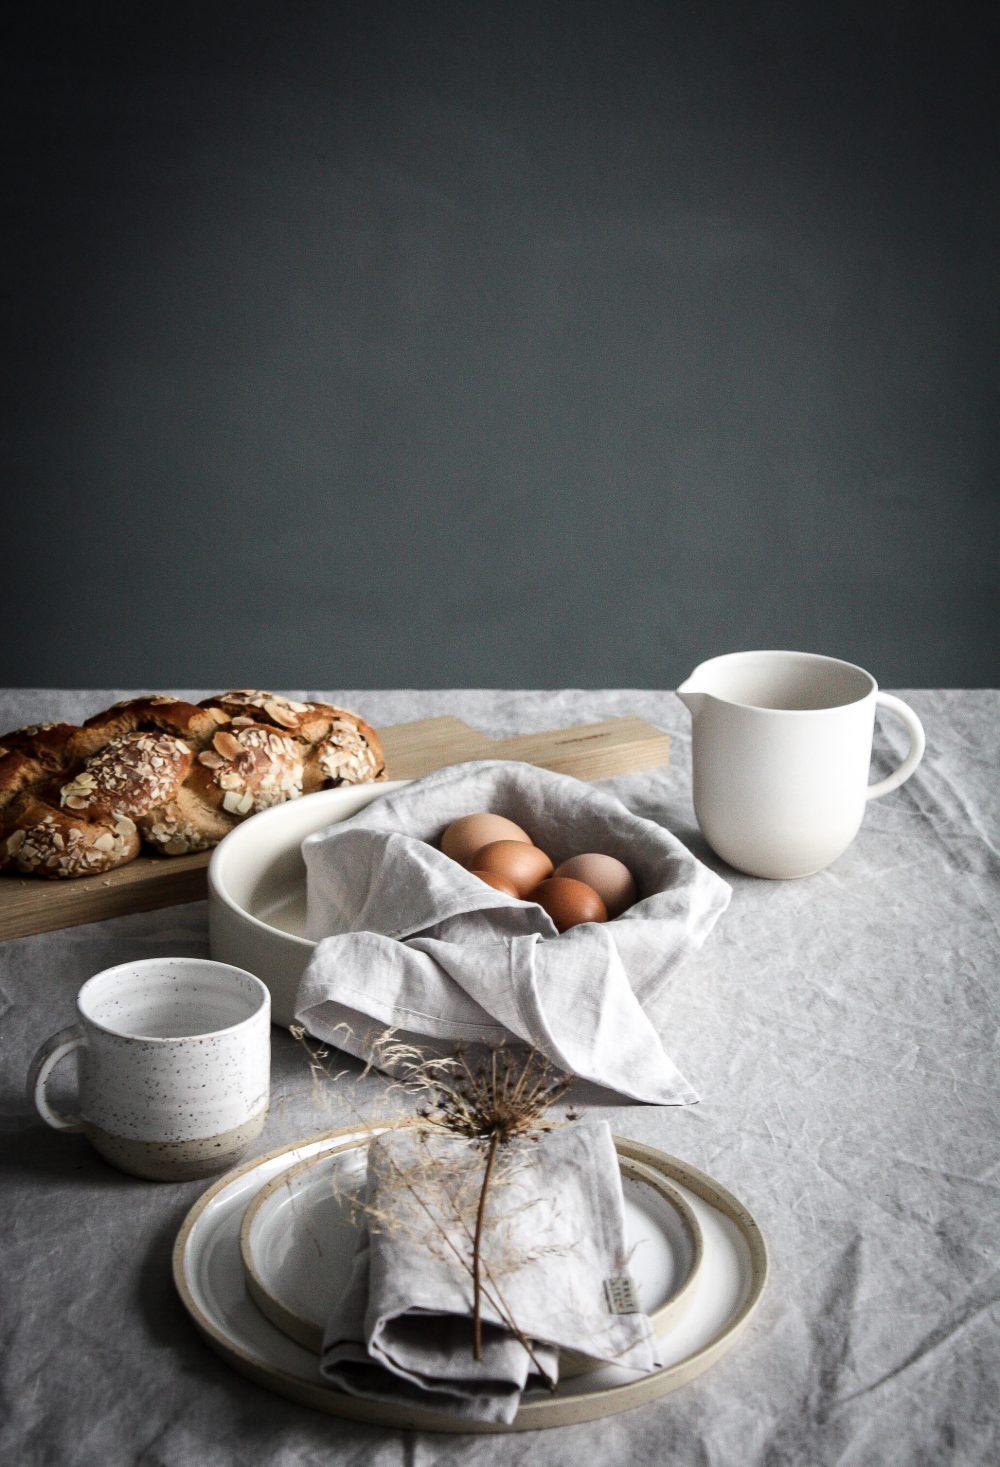 Easter Brunch table setting- celebrating nature and serene minimalism